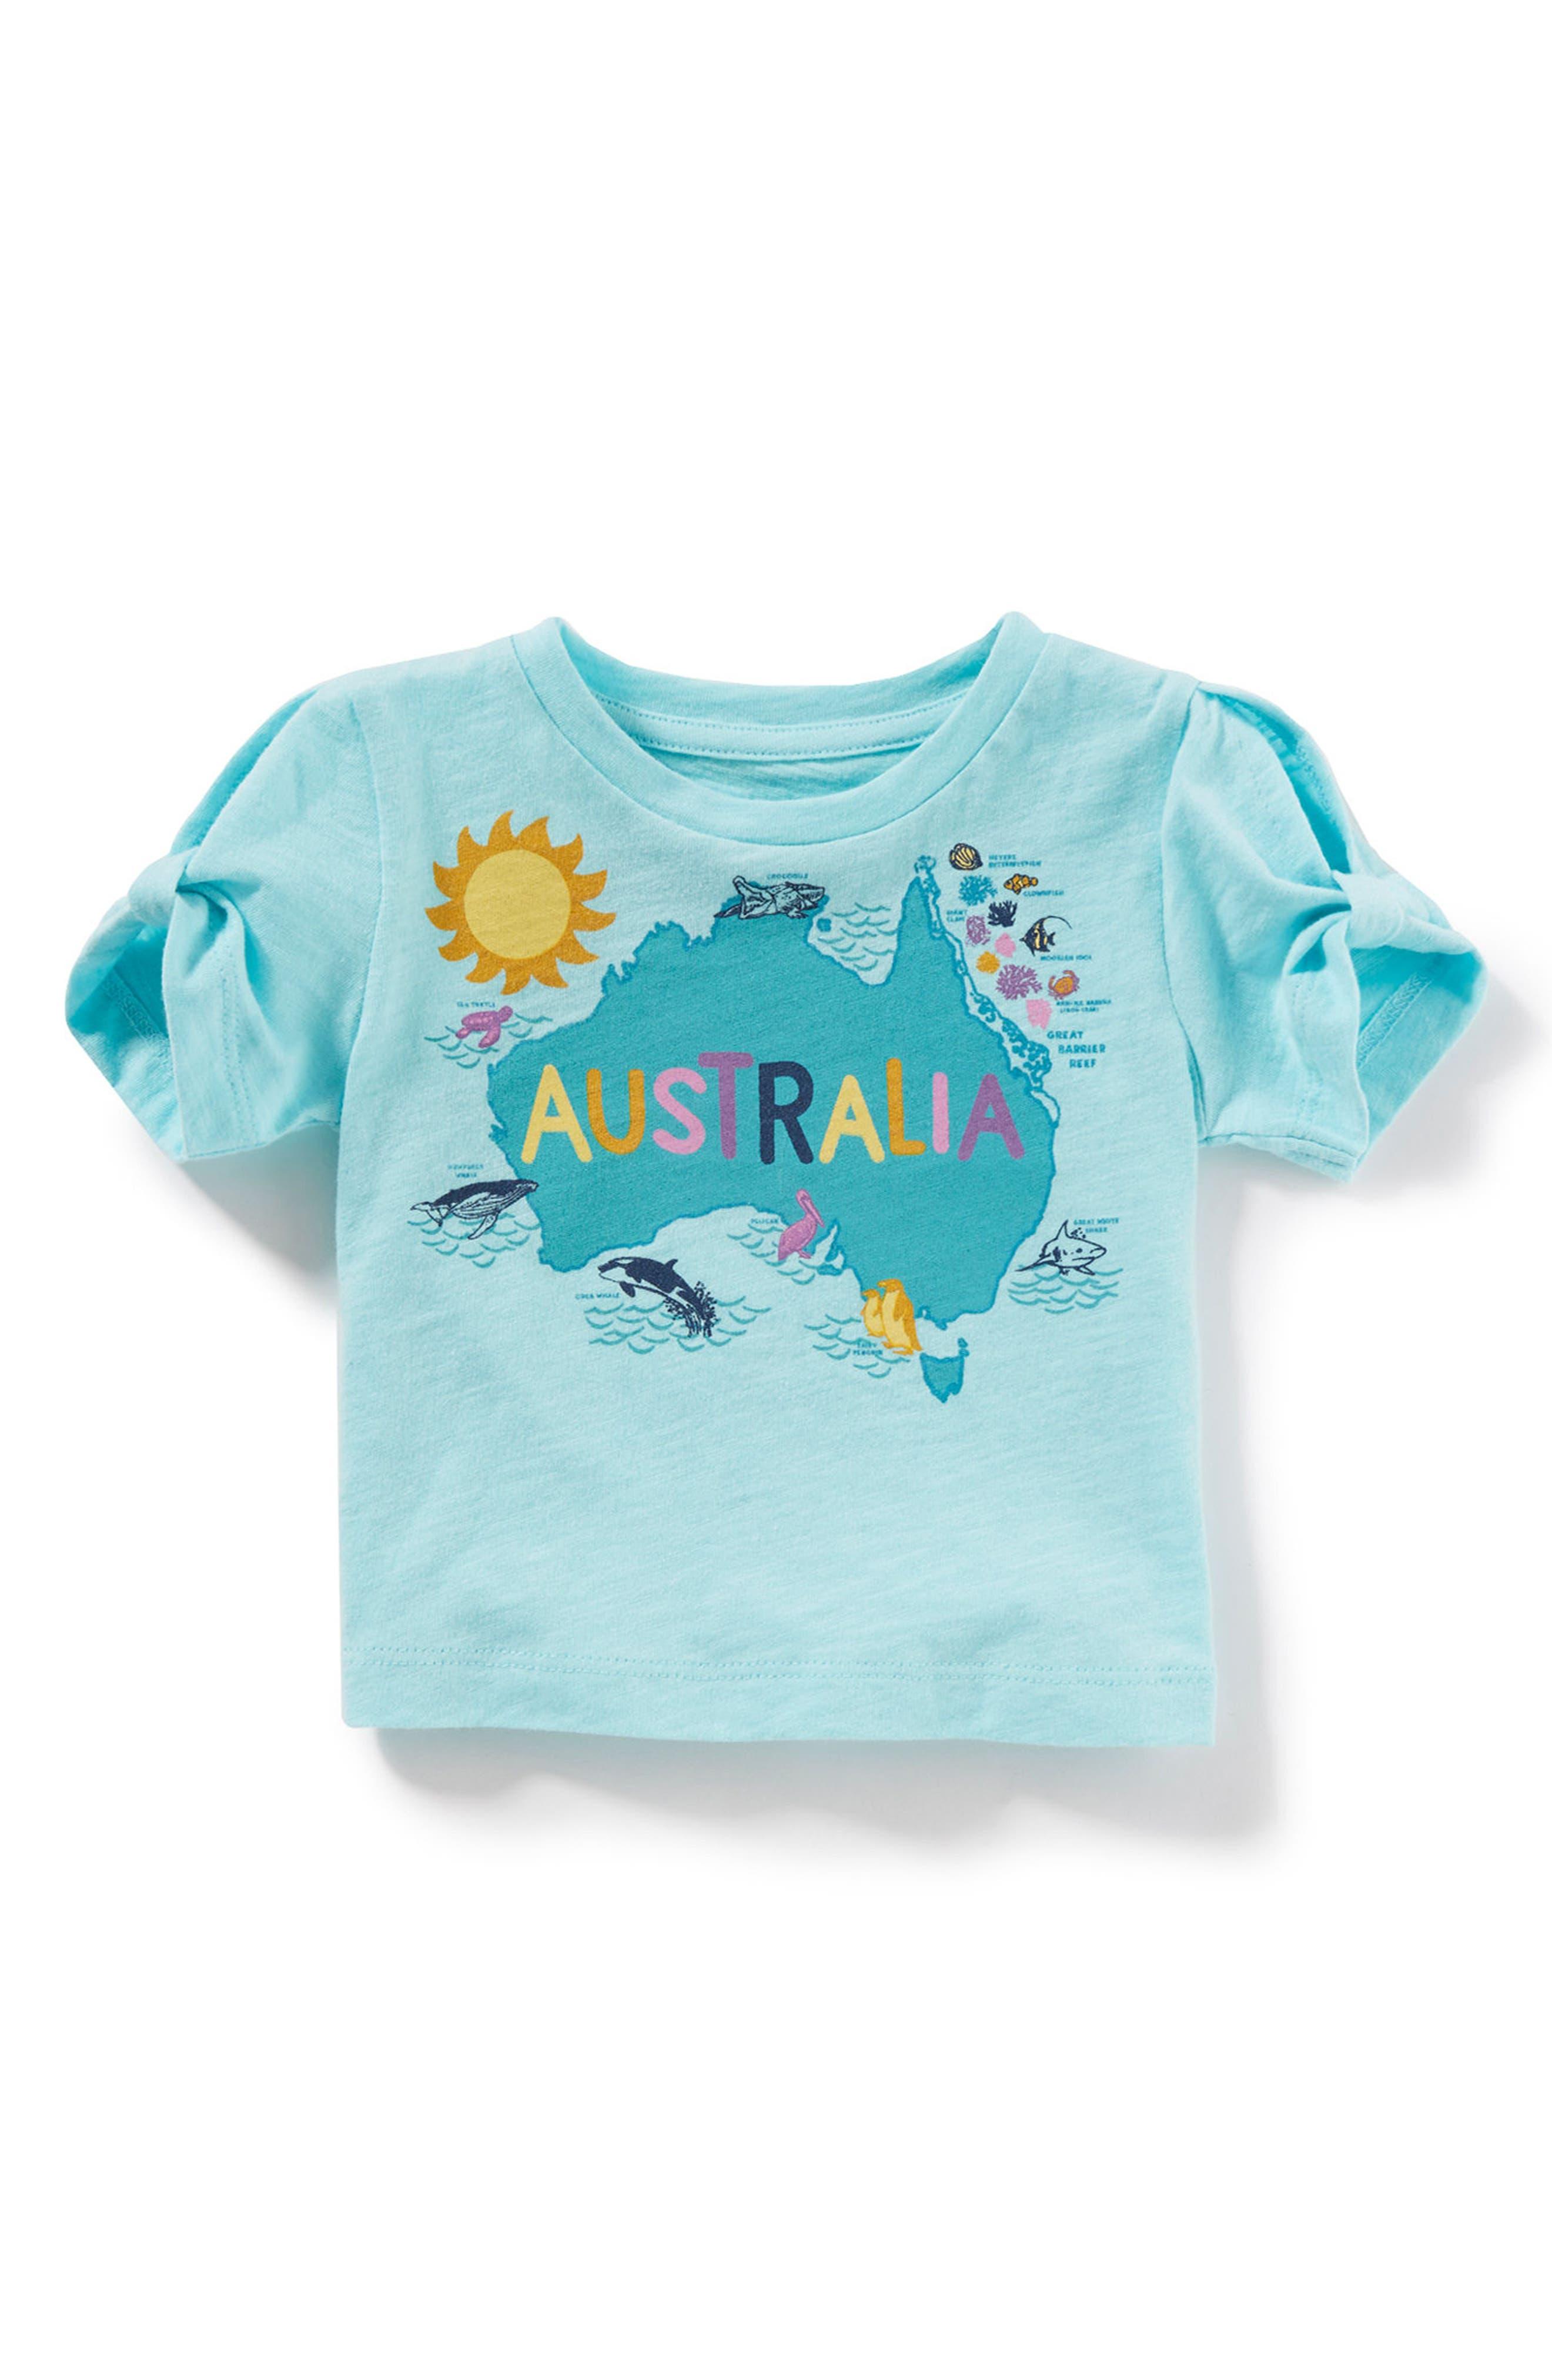 Australia Tee,                         Main,                         color, Aqua